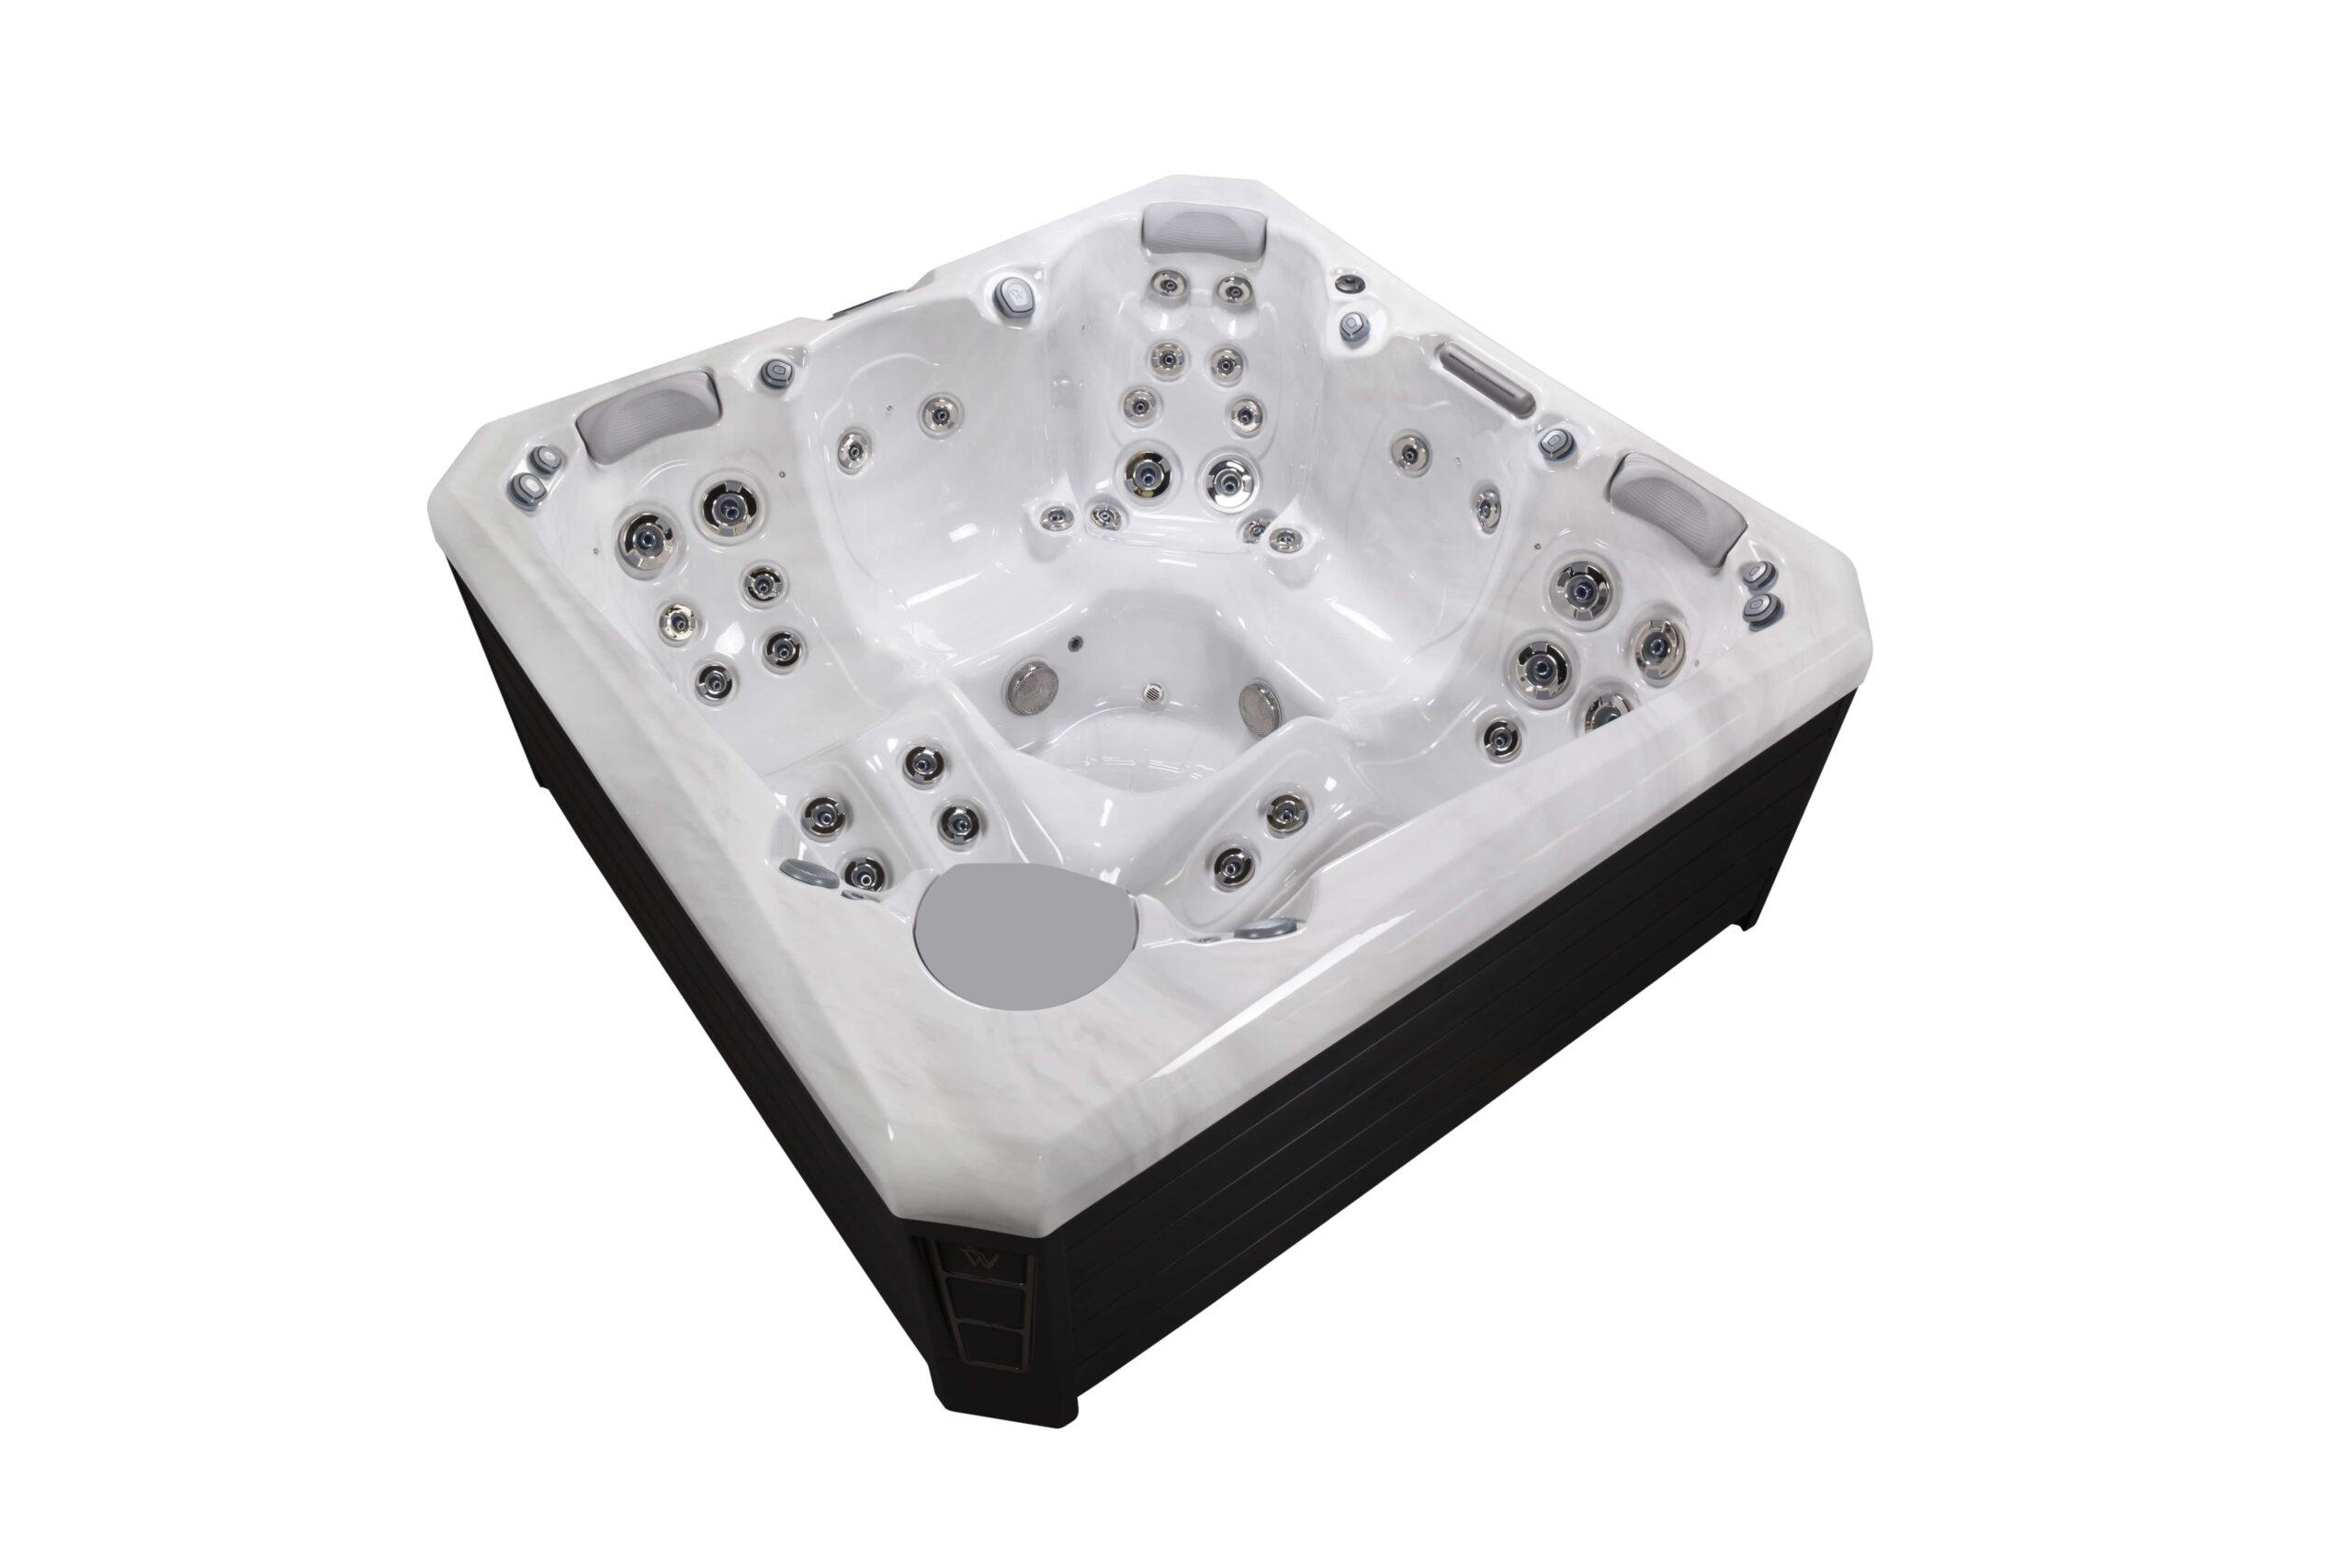 Compact luxury hot tub